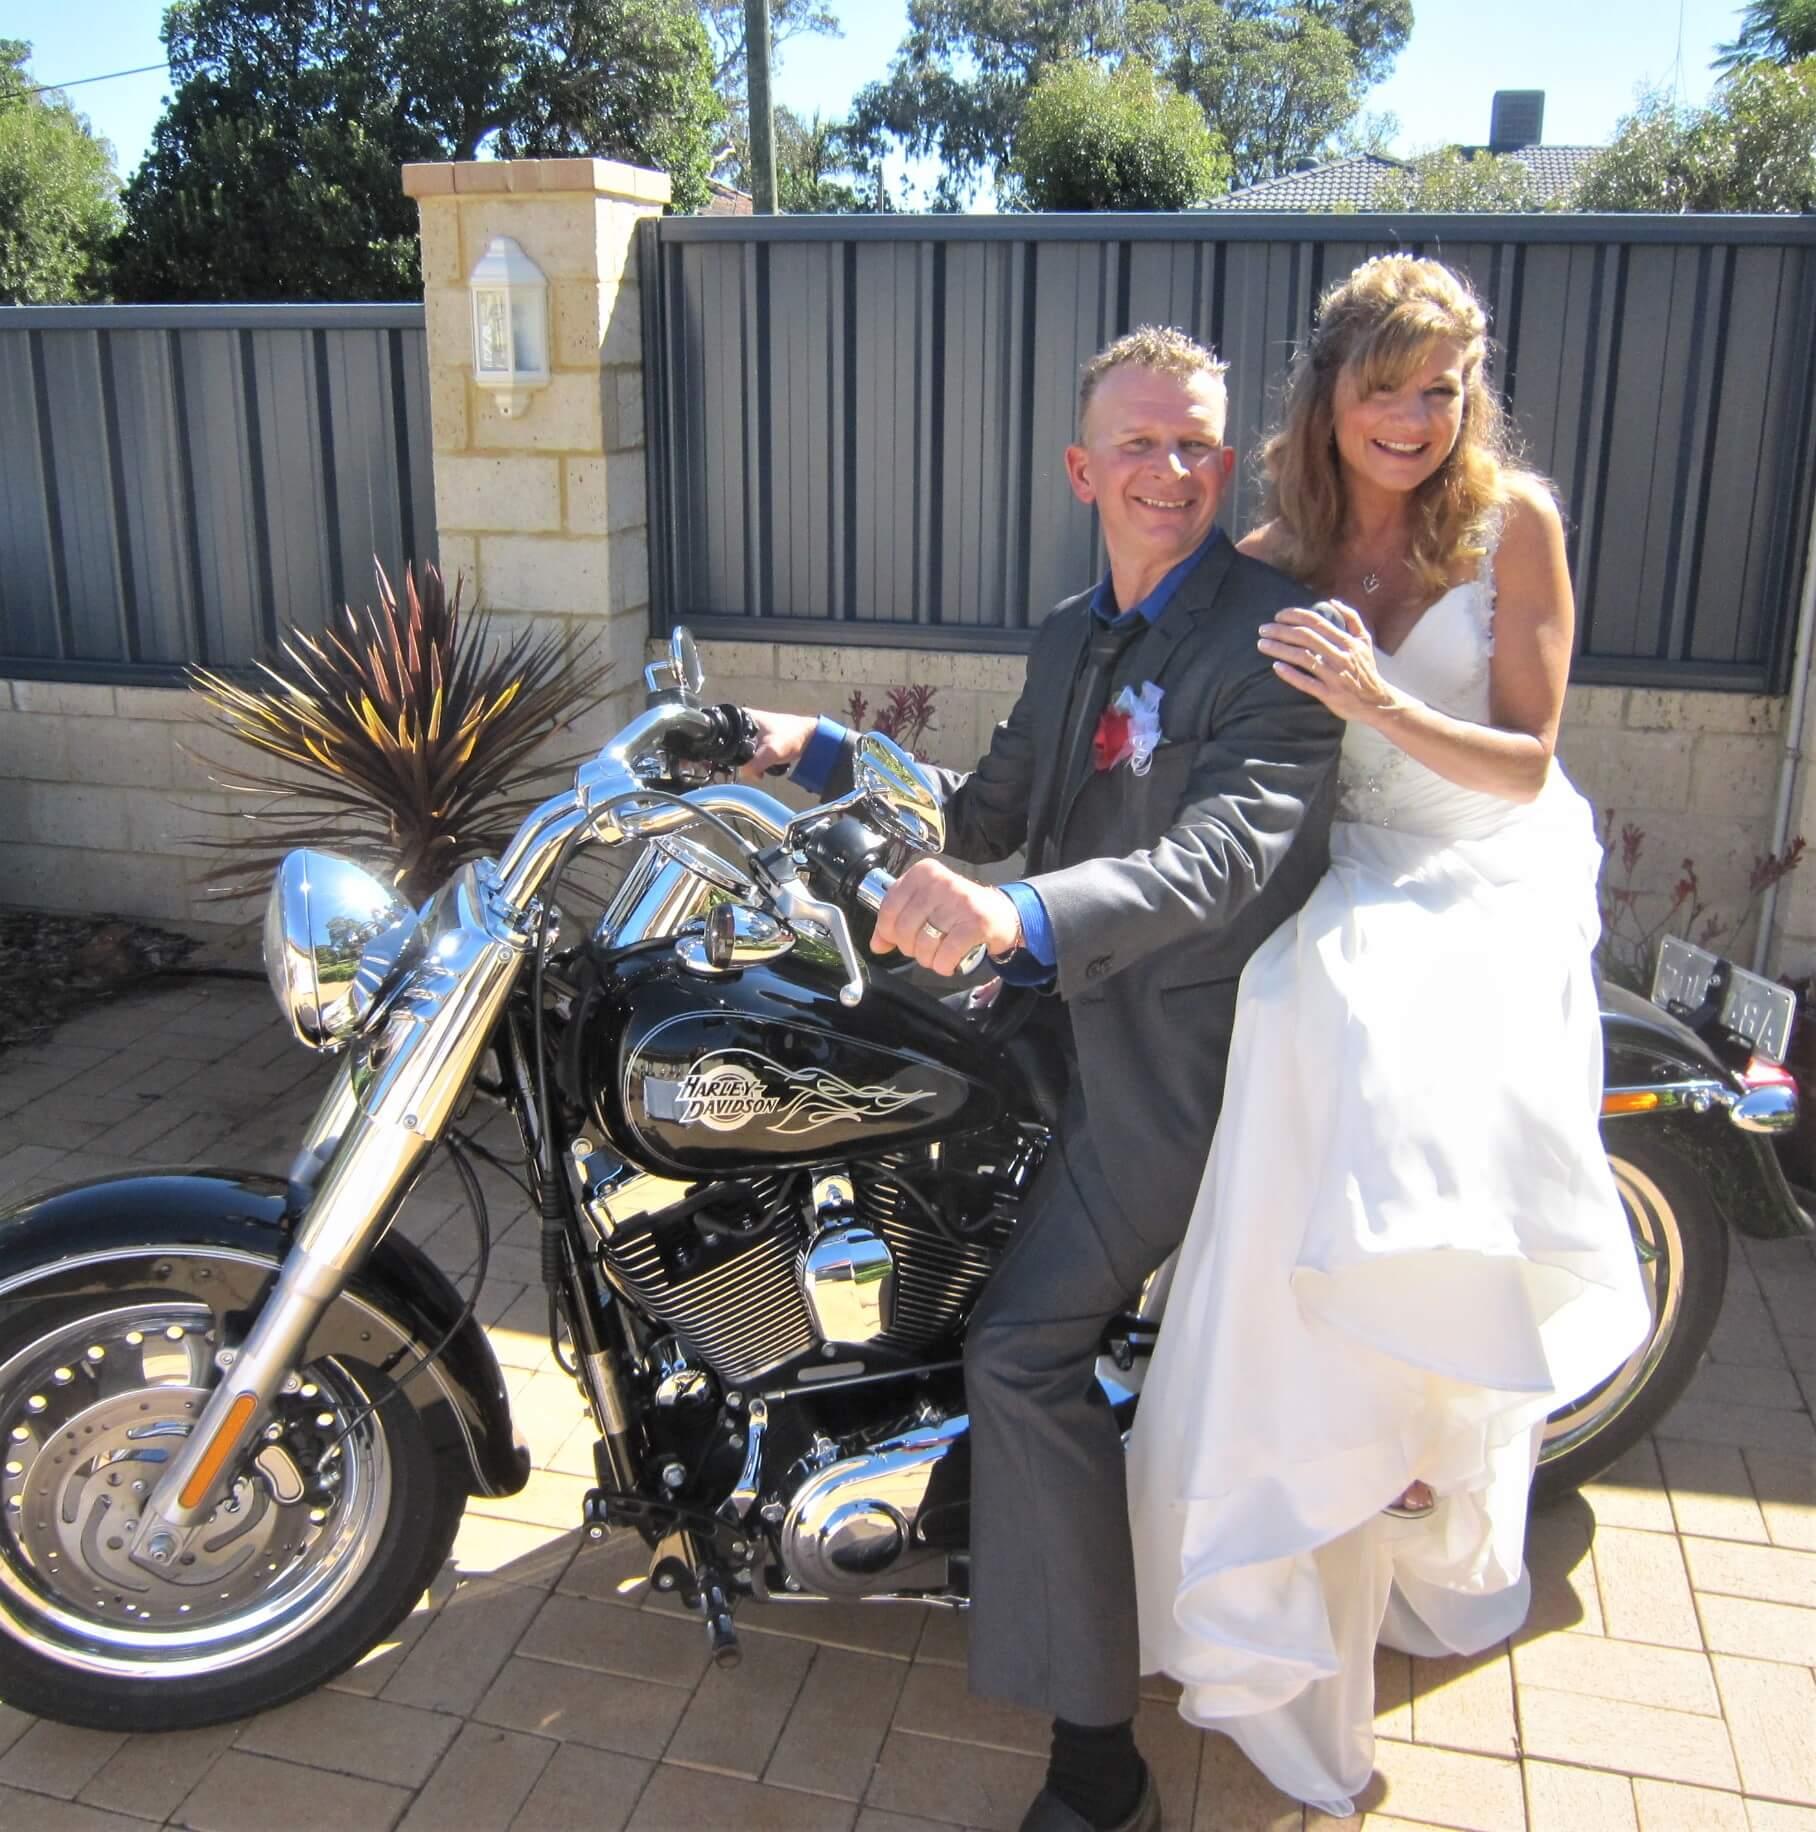 https://www.lovebirdceremonies.com.au/wp-content/uploads/2020/07/Antoinette-Adrian.jpg